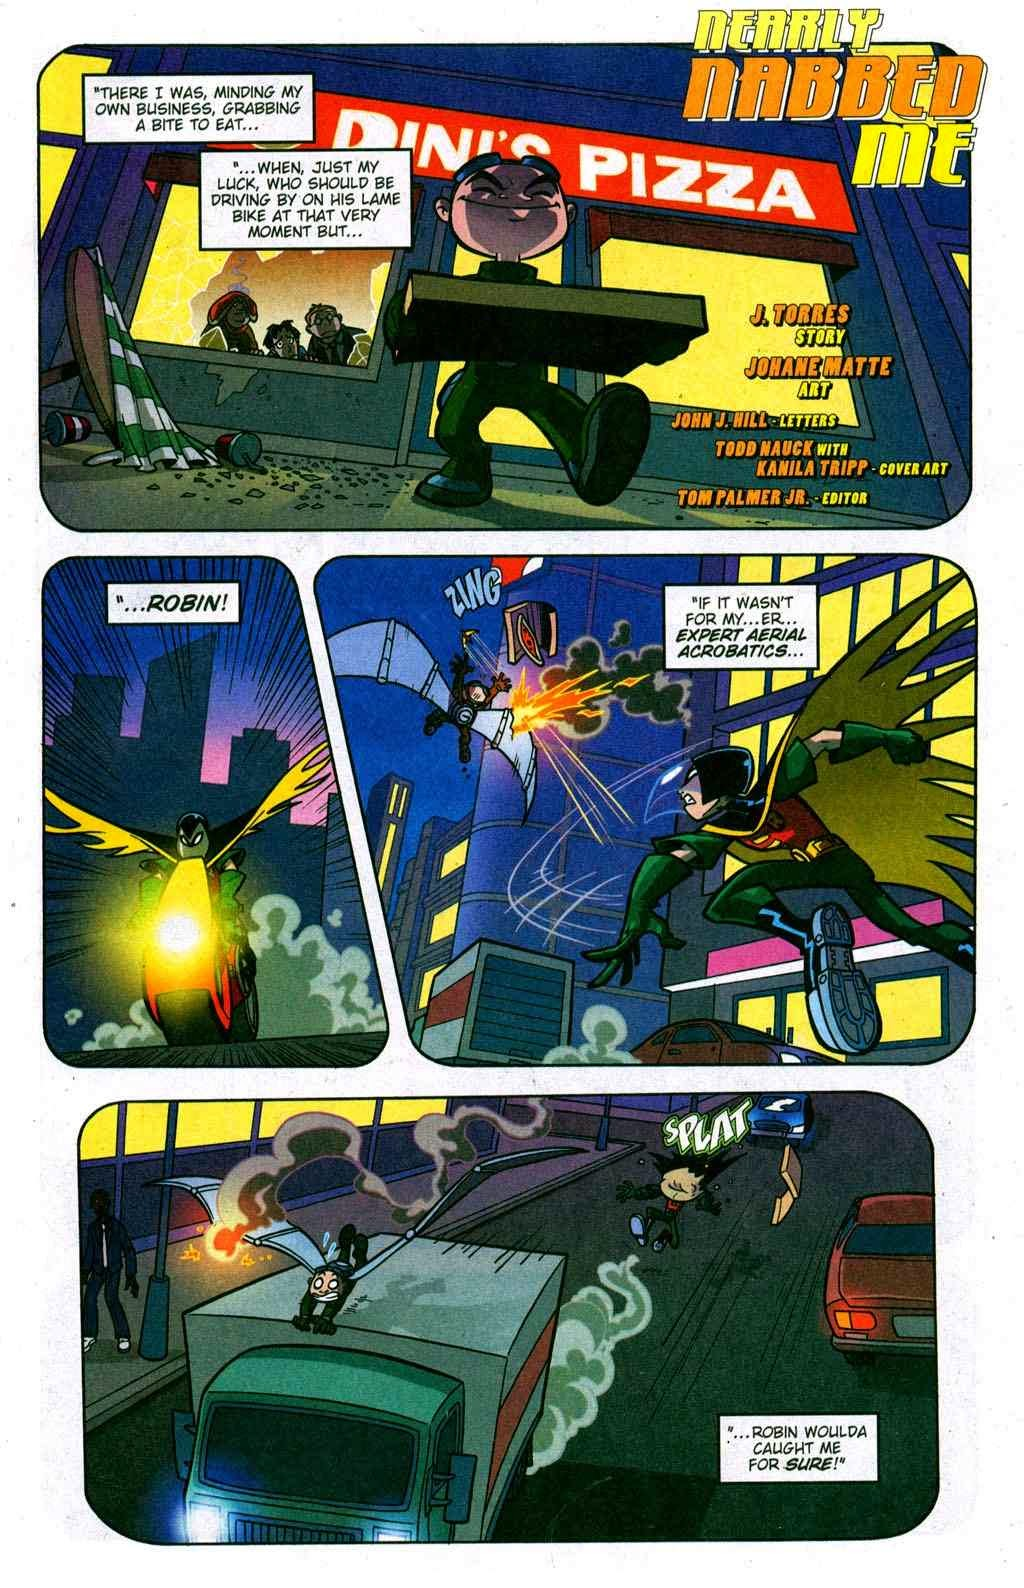 Lightning teen titans comic